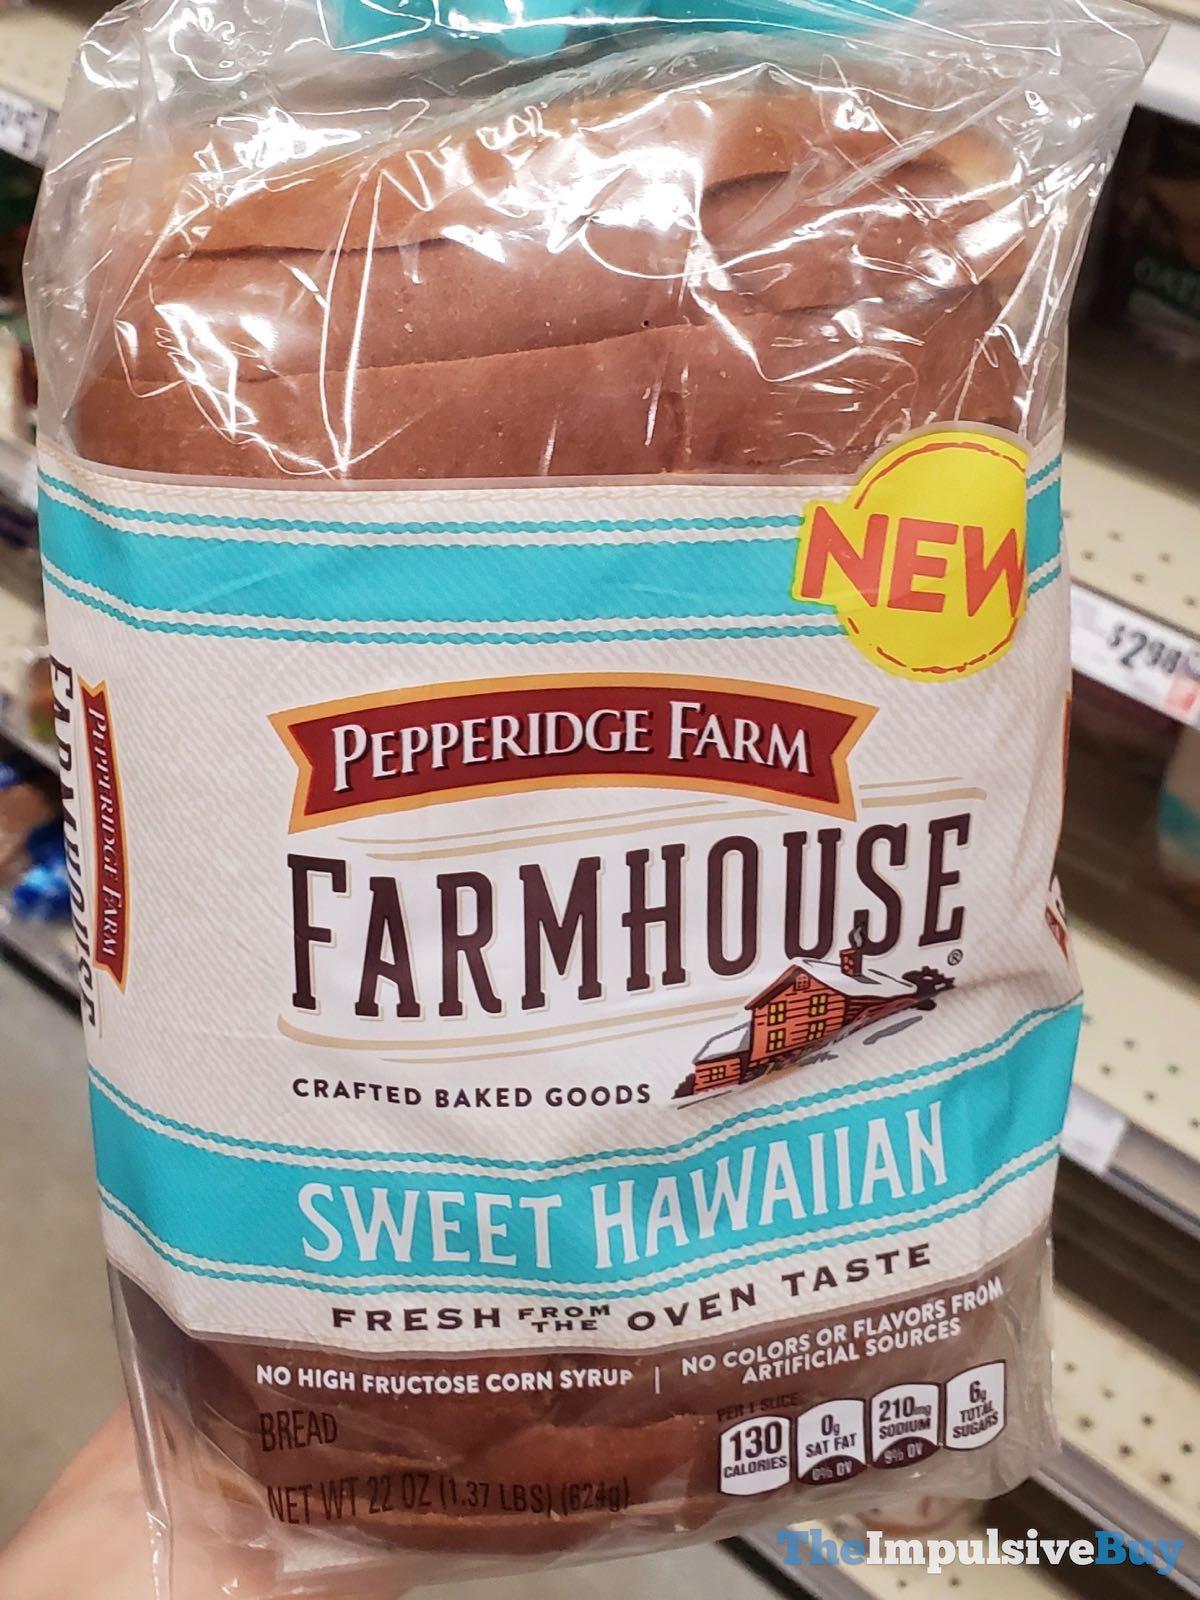 Pepperidge Farm Farmhouse Sweet Hawaiian Bread Jpg The Impulsive Buy